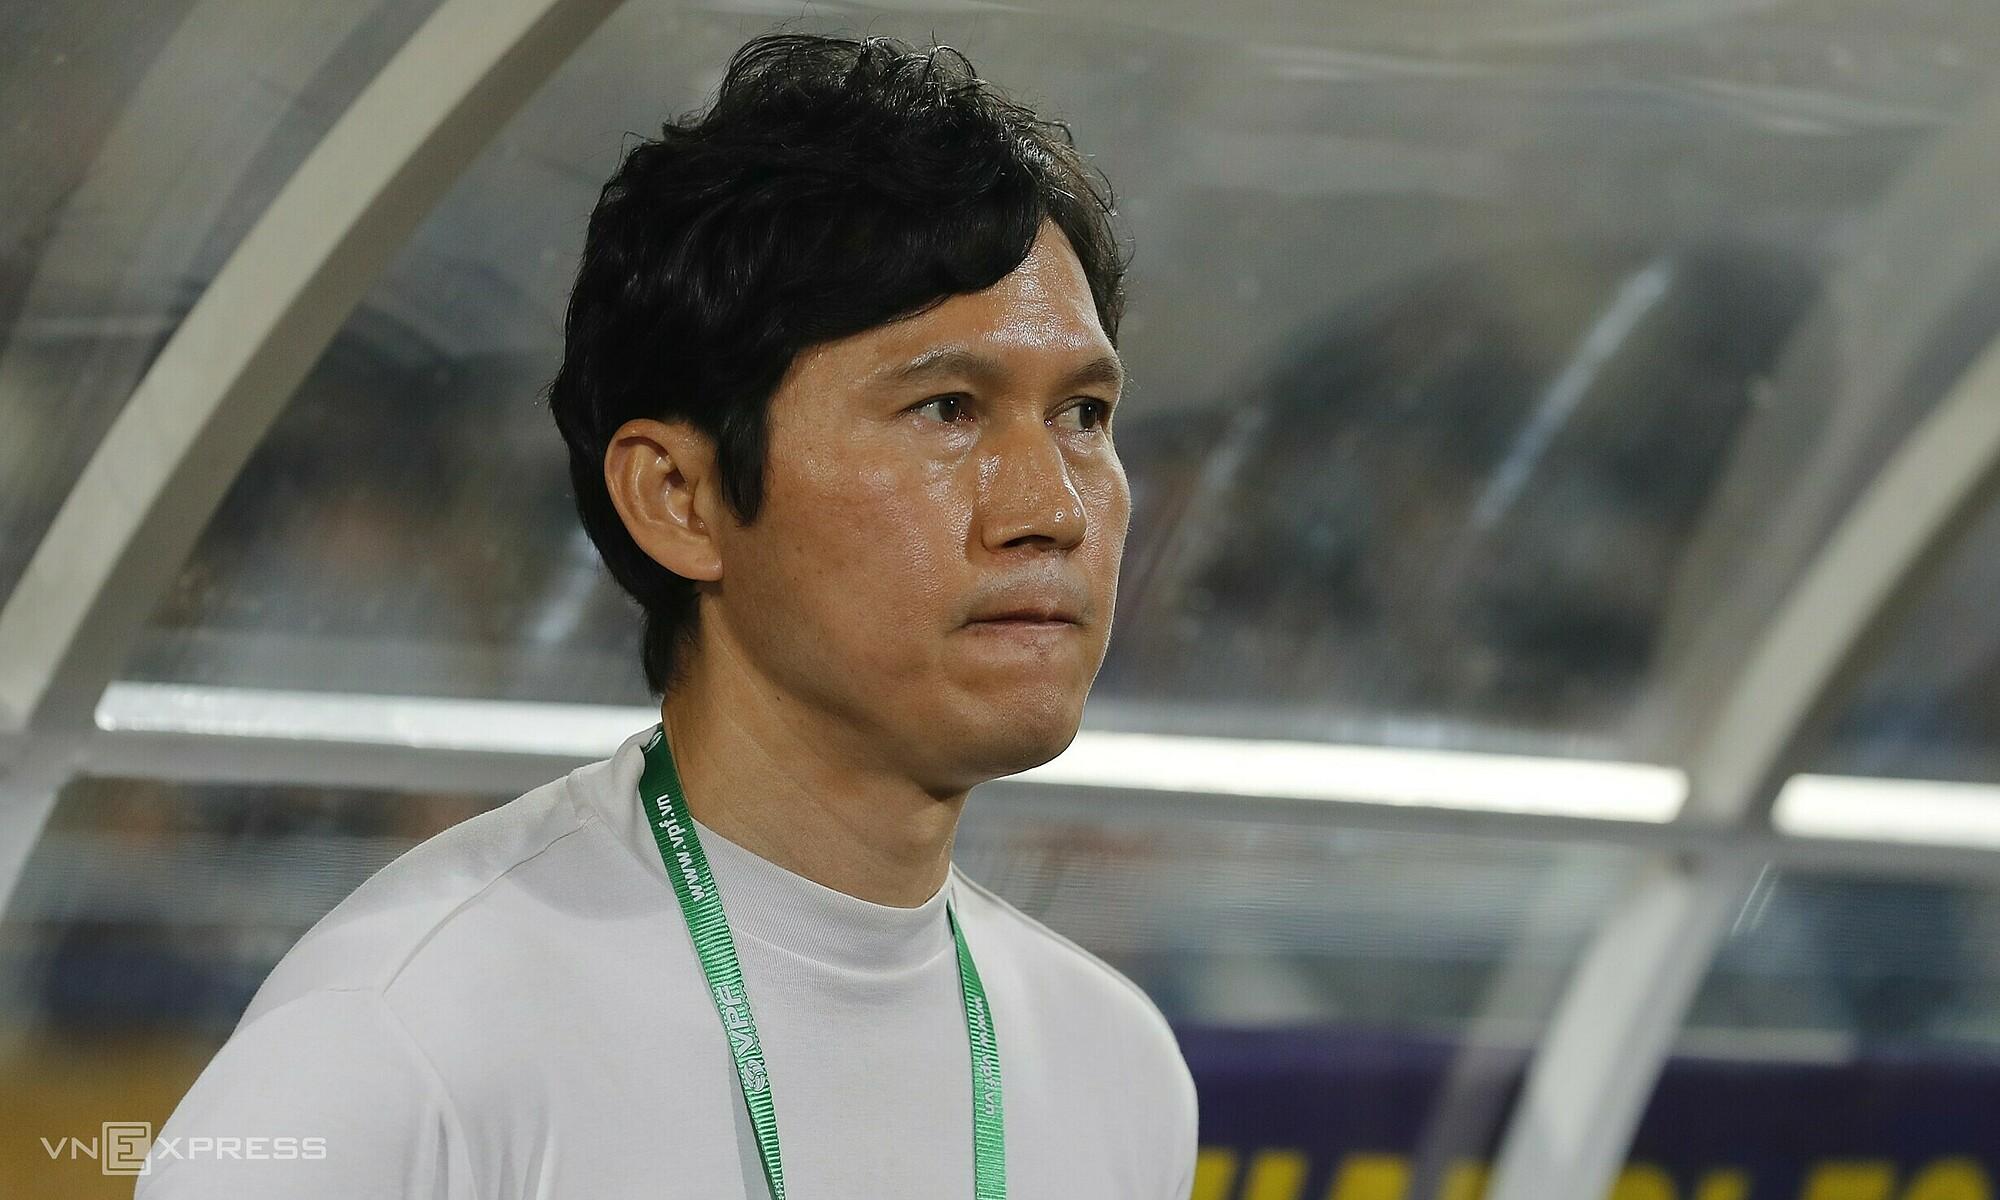 Coach Park bekerja di klub Korea dan Cina sebelum pergi ke Vietnam untuk memimpin Hanoi FC.